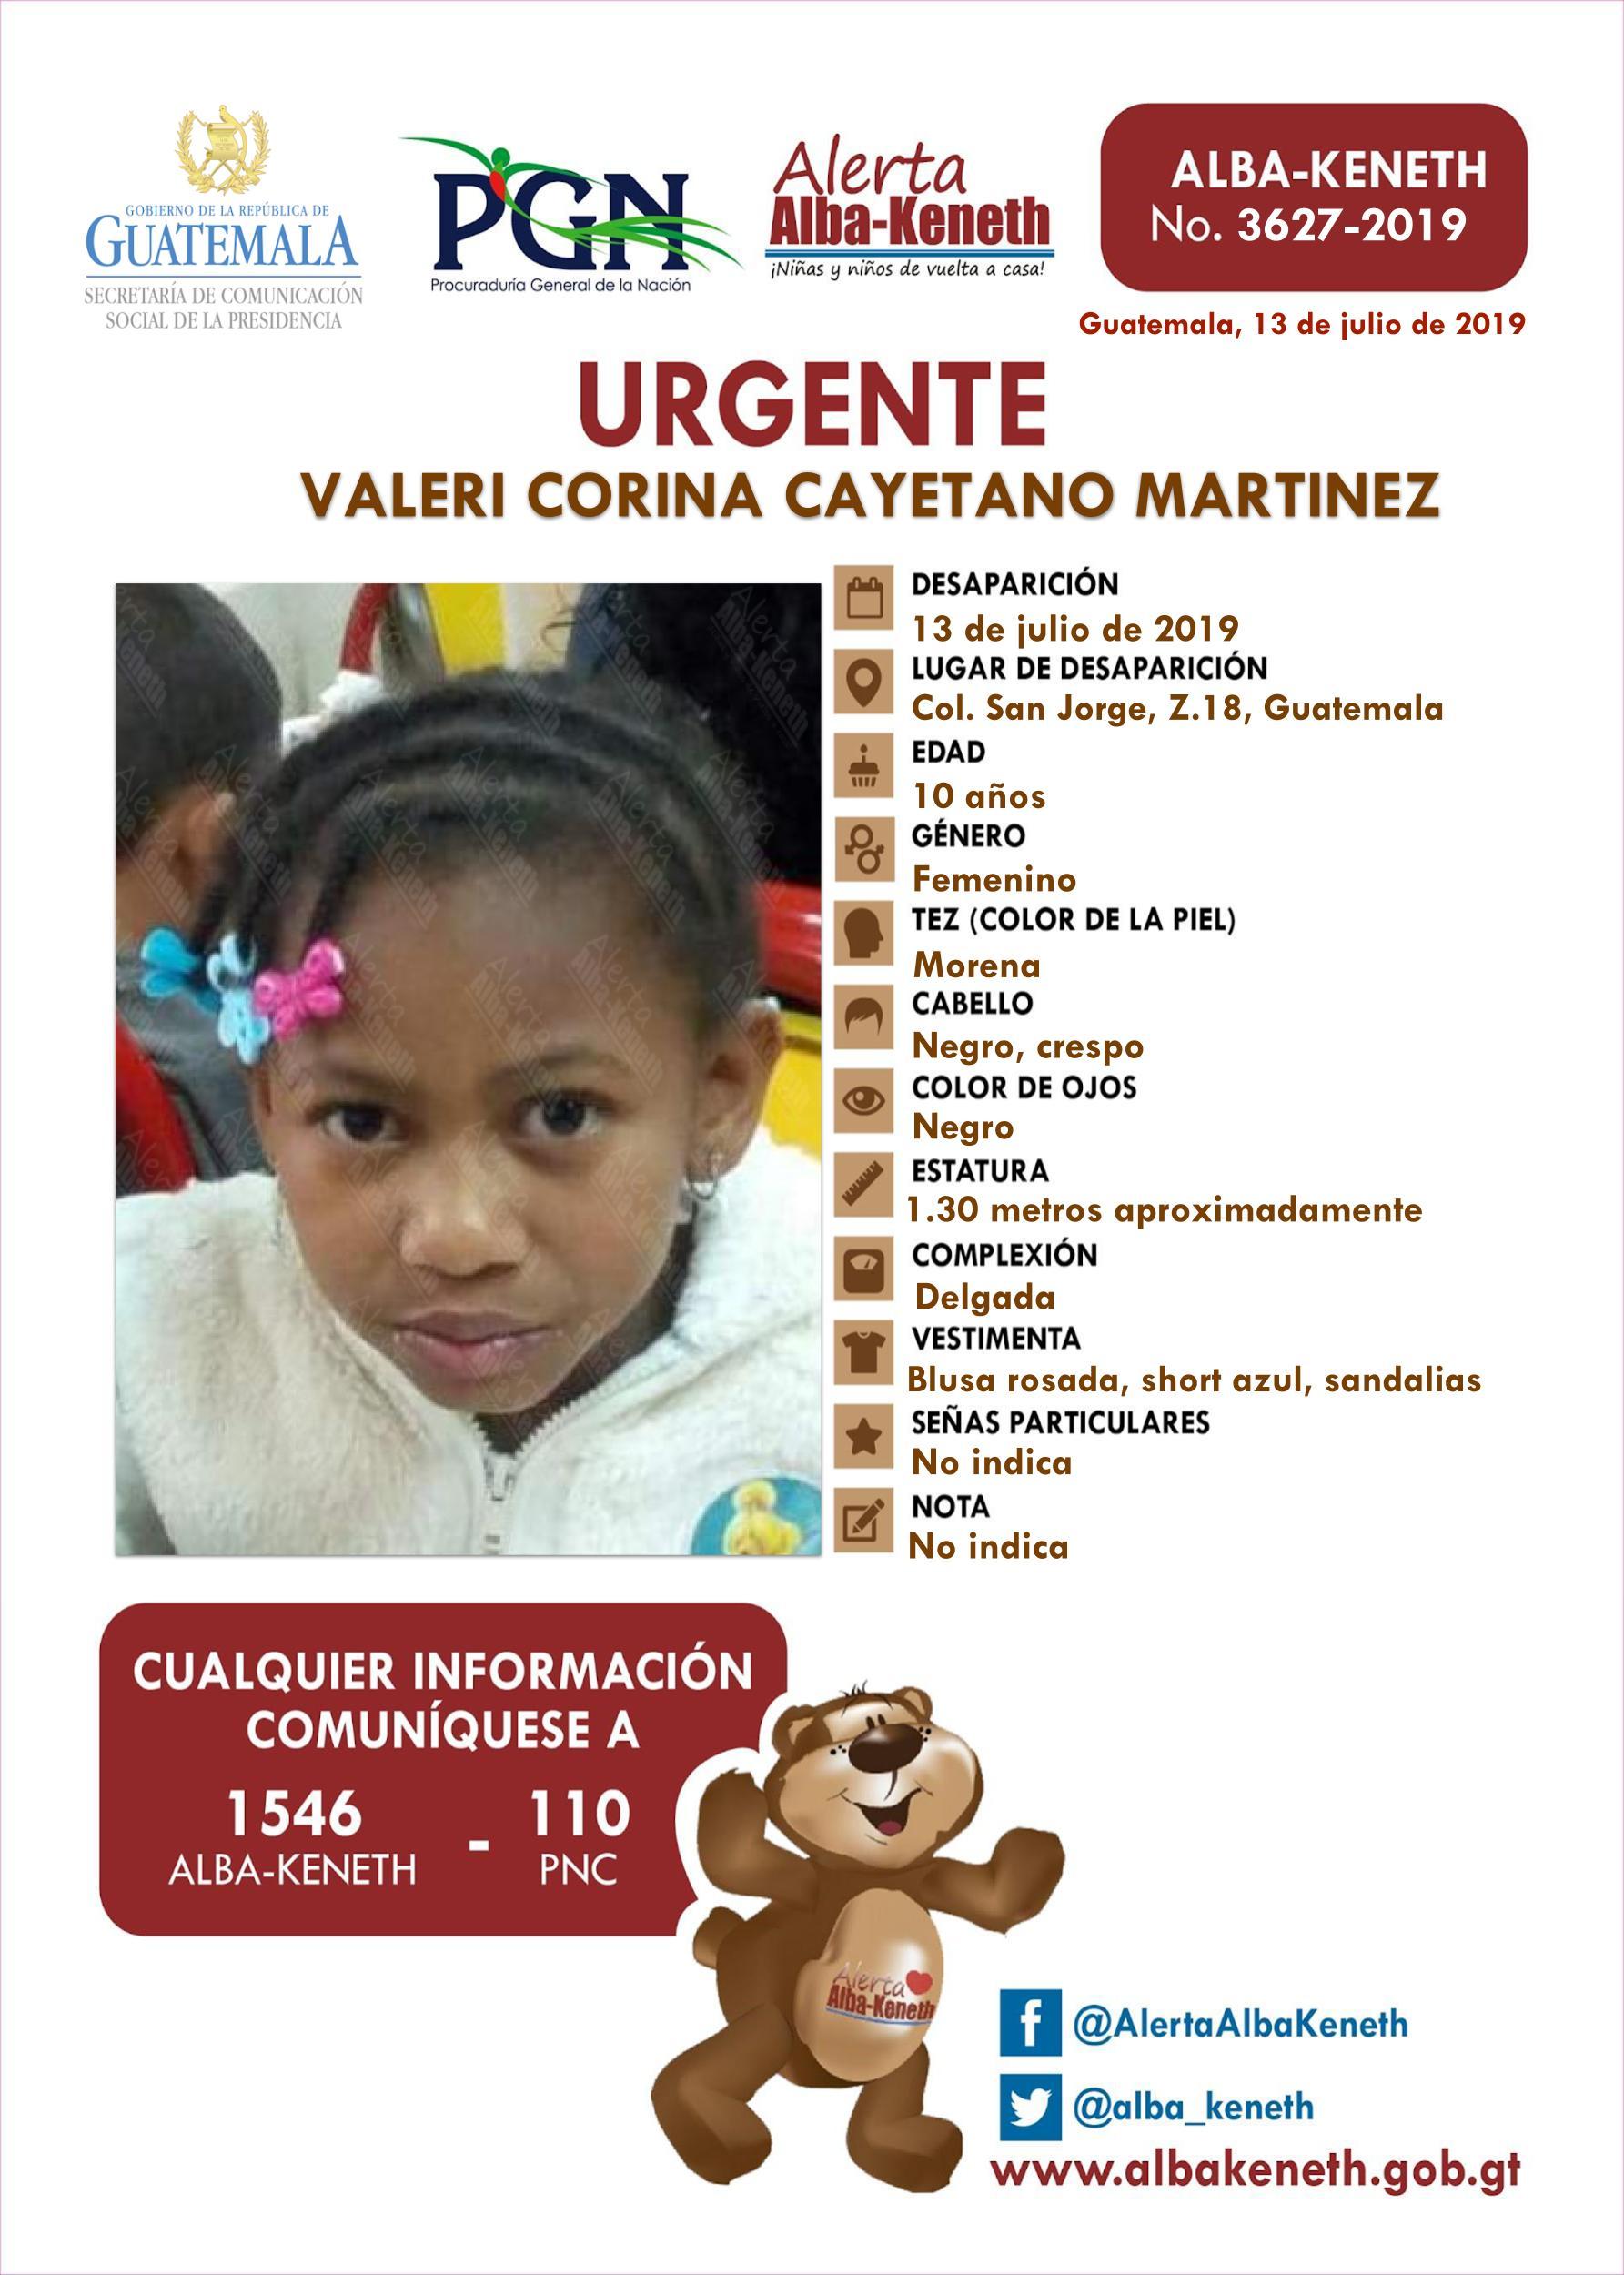 Valeri Corina Cayetano Martinez